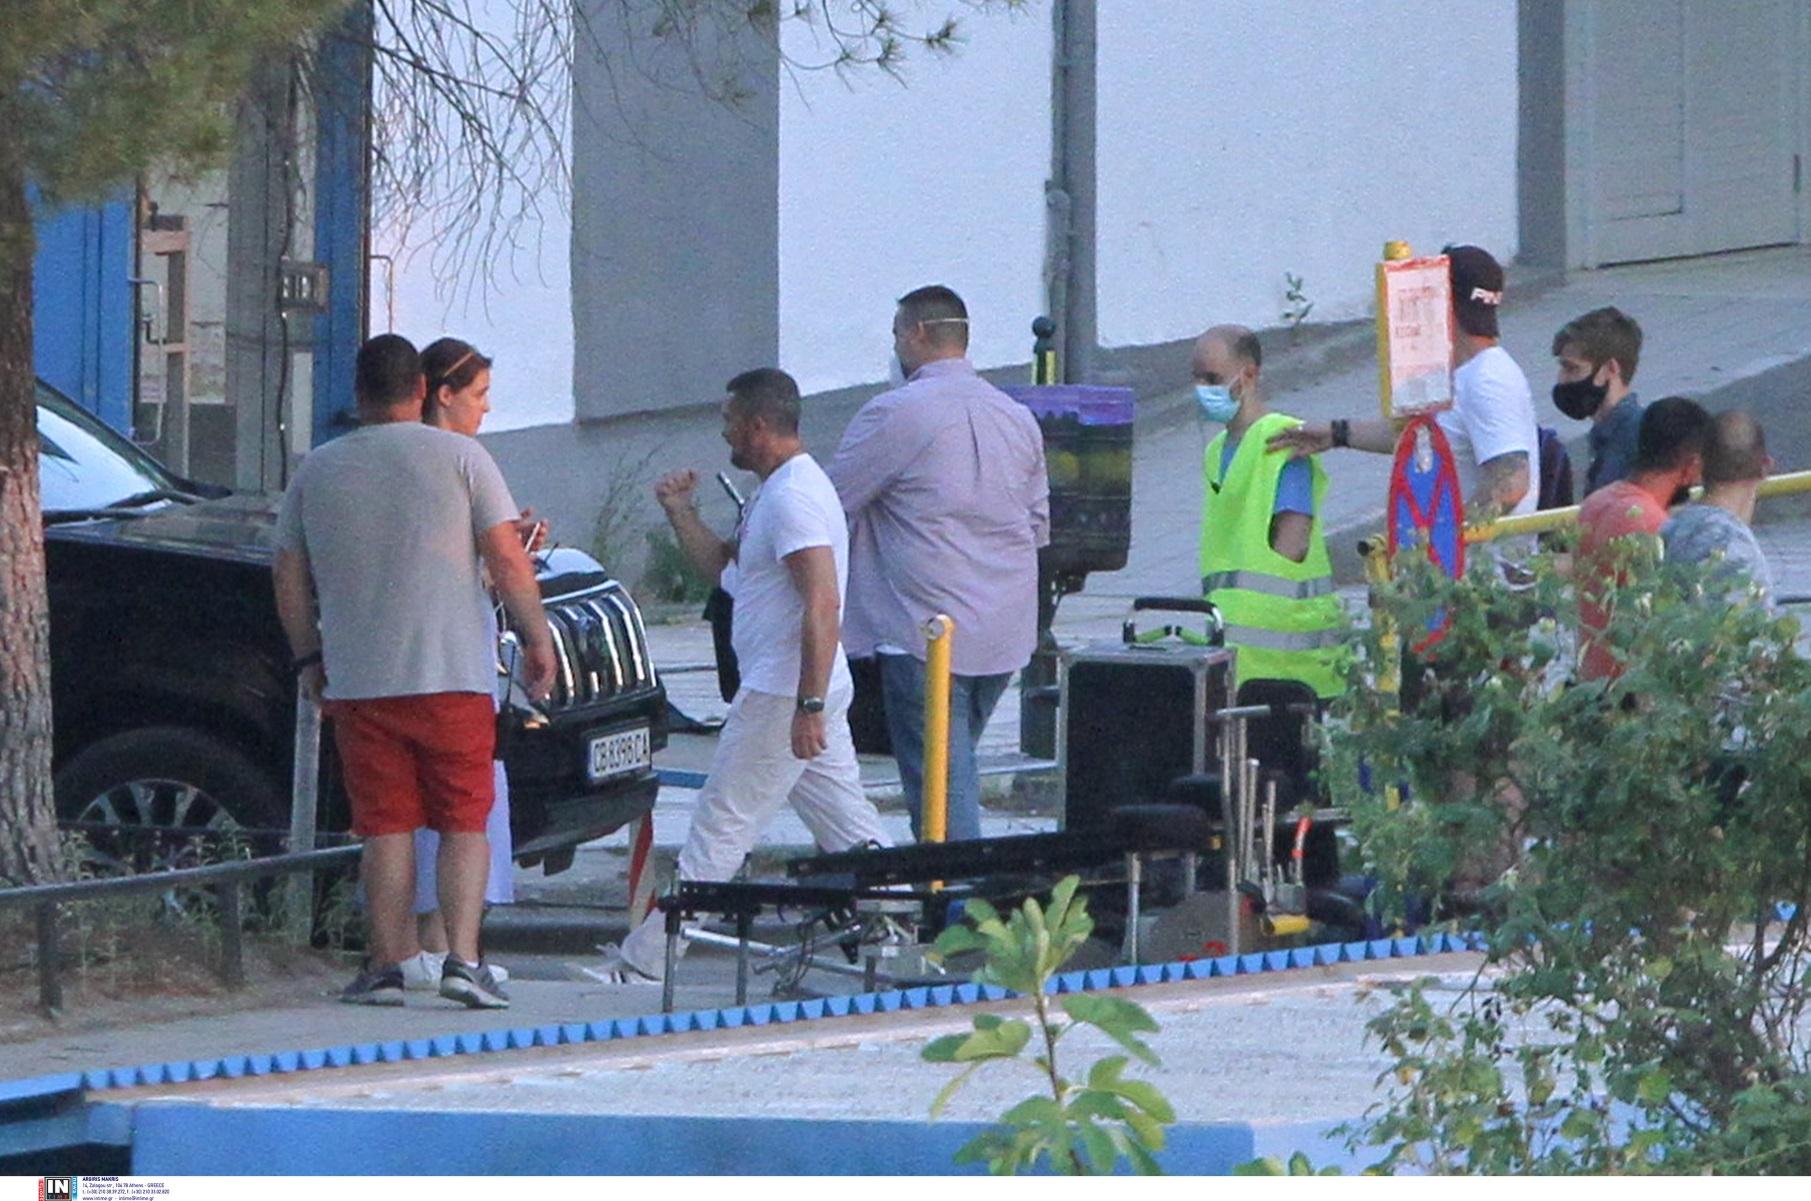 «The Enforcer» – Μπαντέρας: Βραδινή καταδίωξη στον περιφερειακό της Θεσσαλονίκης